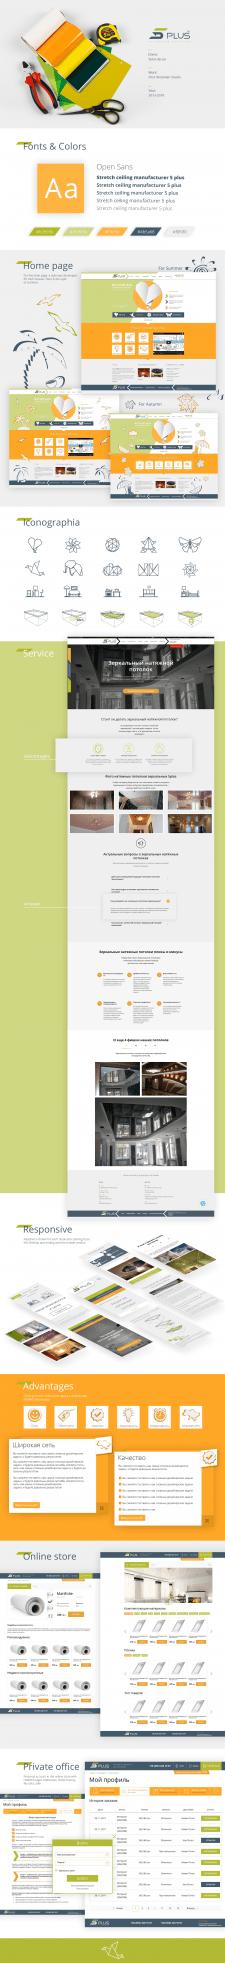 Дизайн корпоративного сайта 5plus.dp.ua